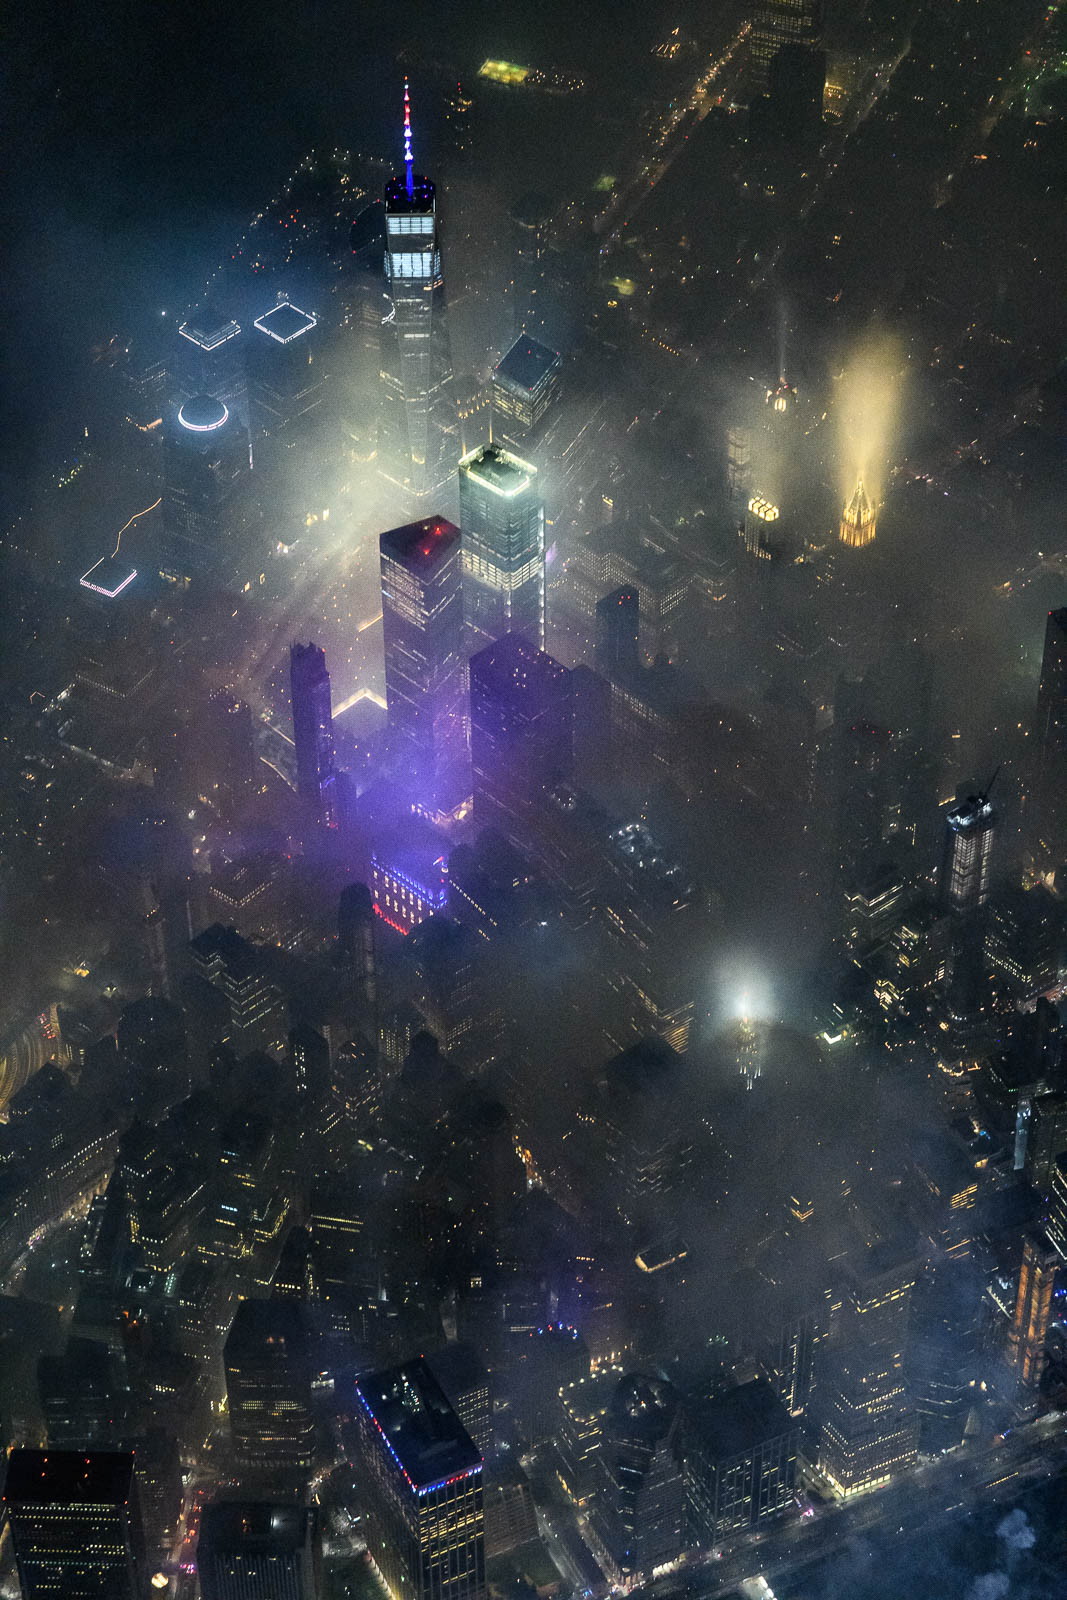 Smoky Downtown Manhattan